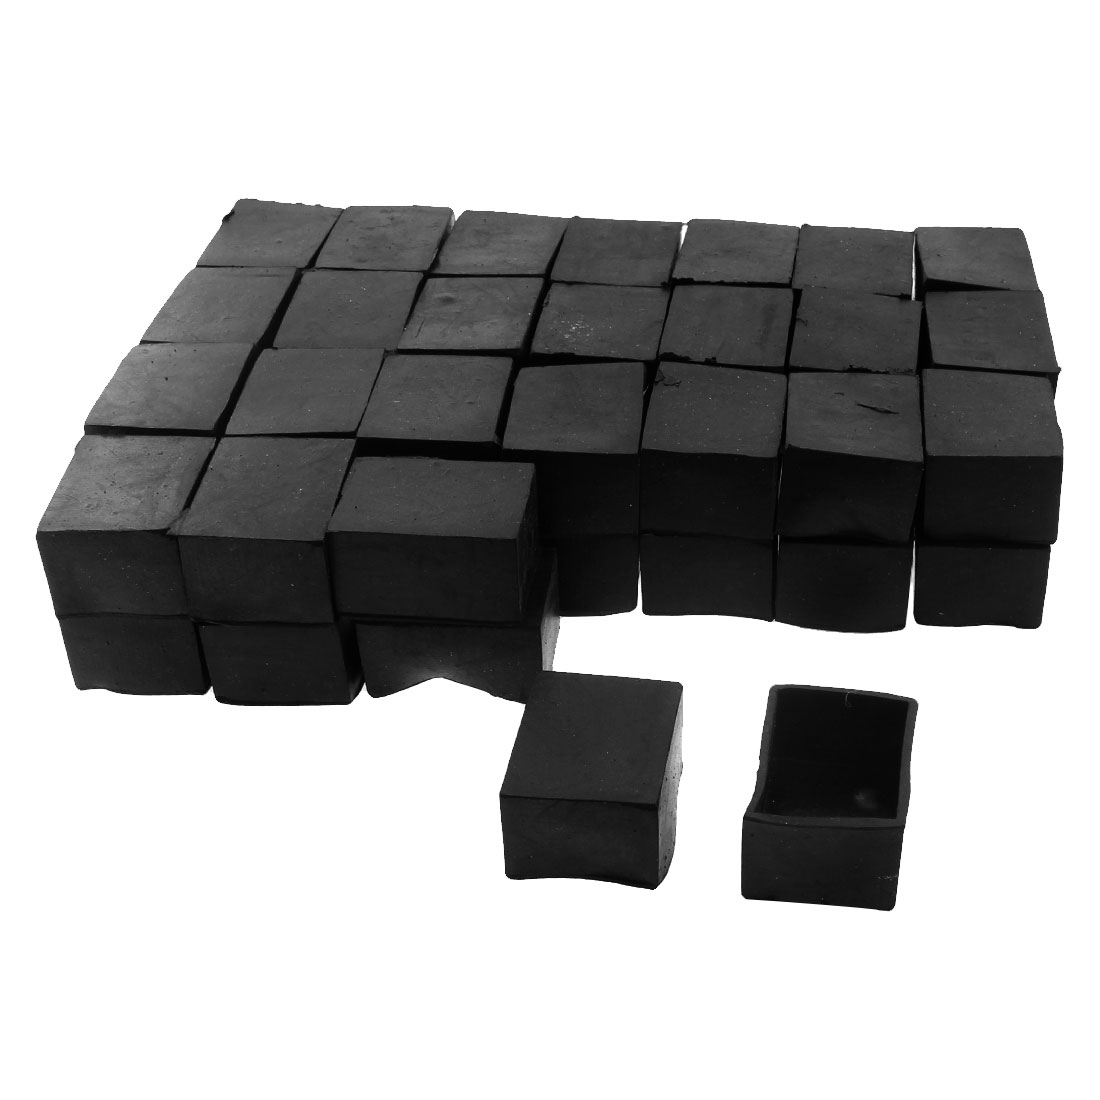 40mm x 30mm Rectangle Shape Furniture Table Chair Foot Leg Rubber End Cap Cover Black 50pcs